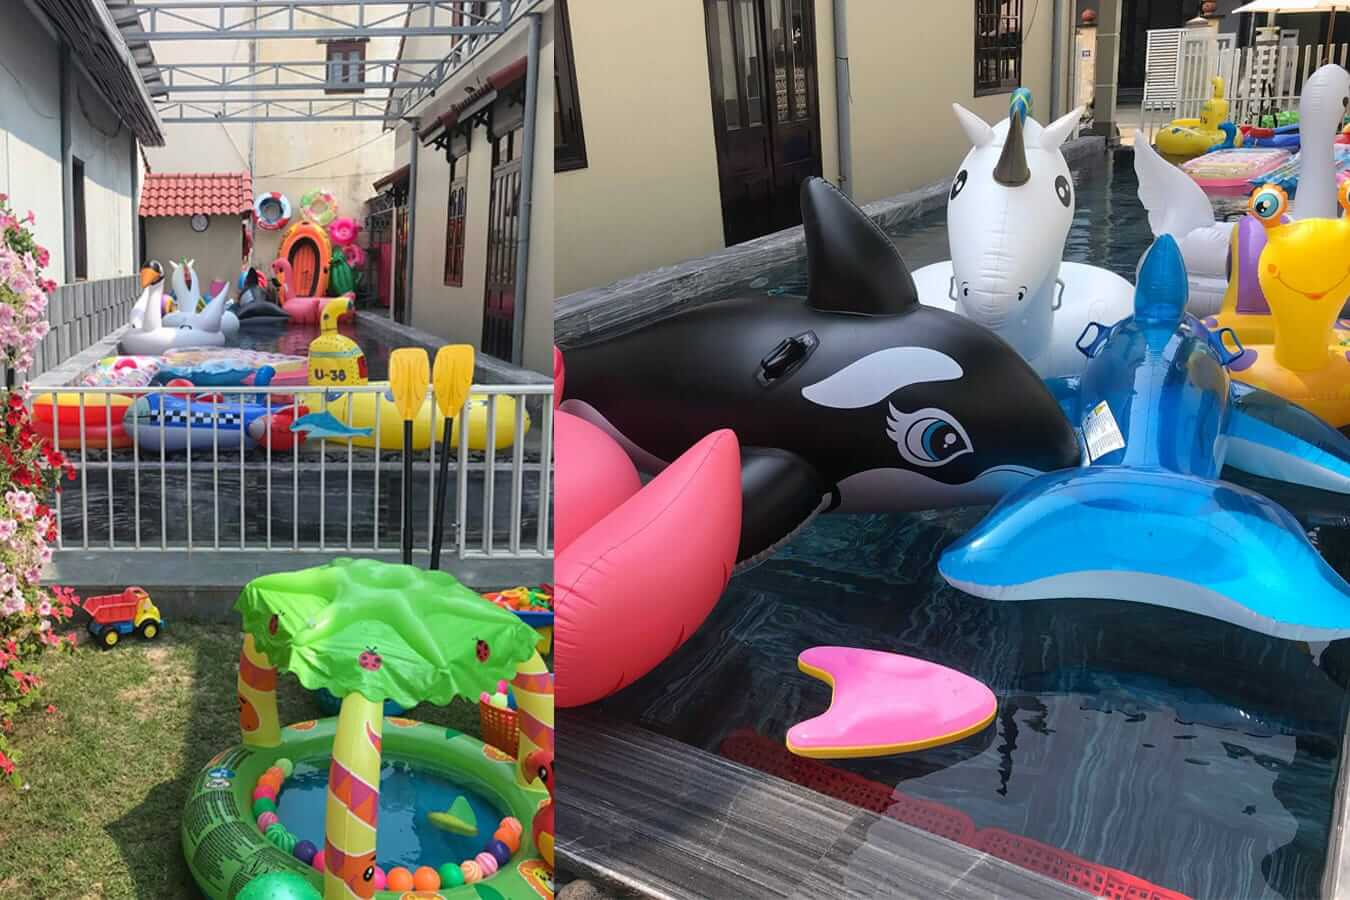 Baby Shark Club's pool: Pools in Hoi An